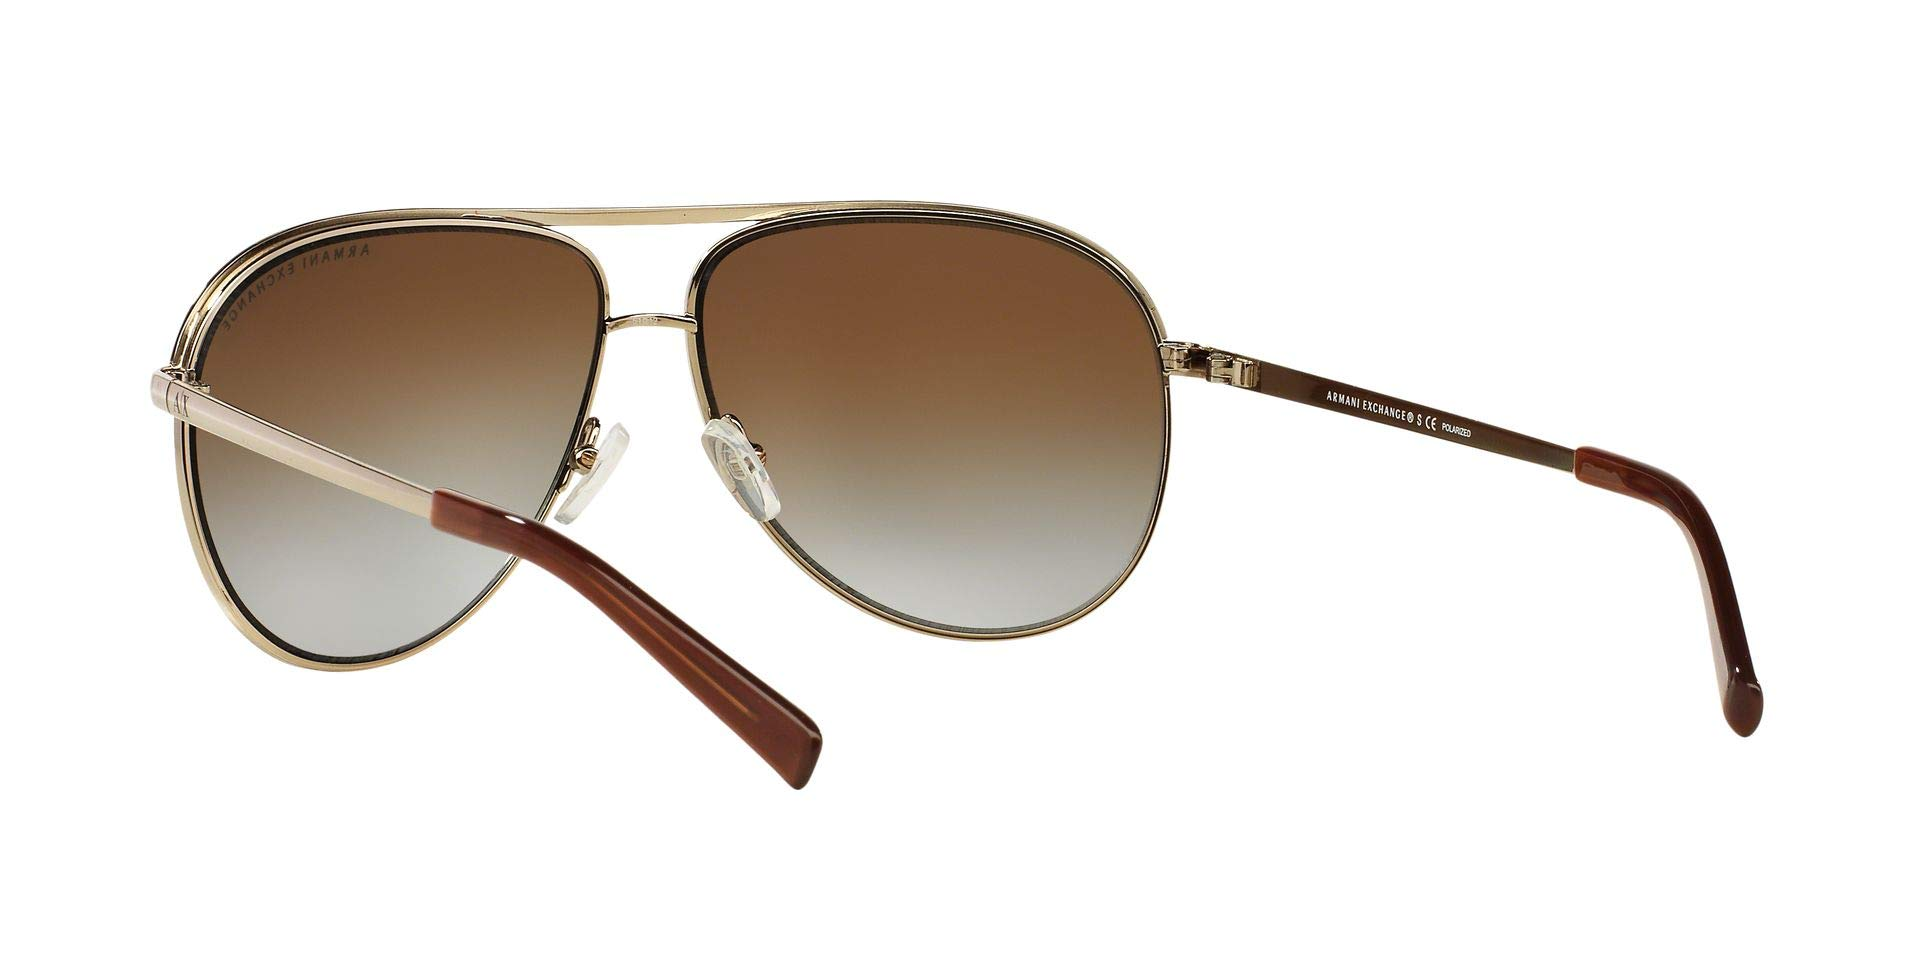 Armani Exchange Metal Unisex Polarized Aviator Sunglasses, Light Gold/Dark Brown, 61 mm by A|X Armani Exchange (Image #7)